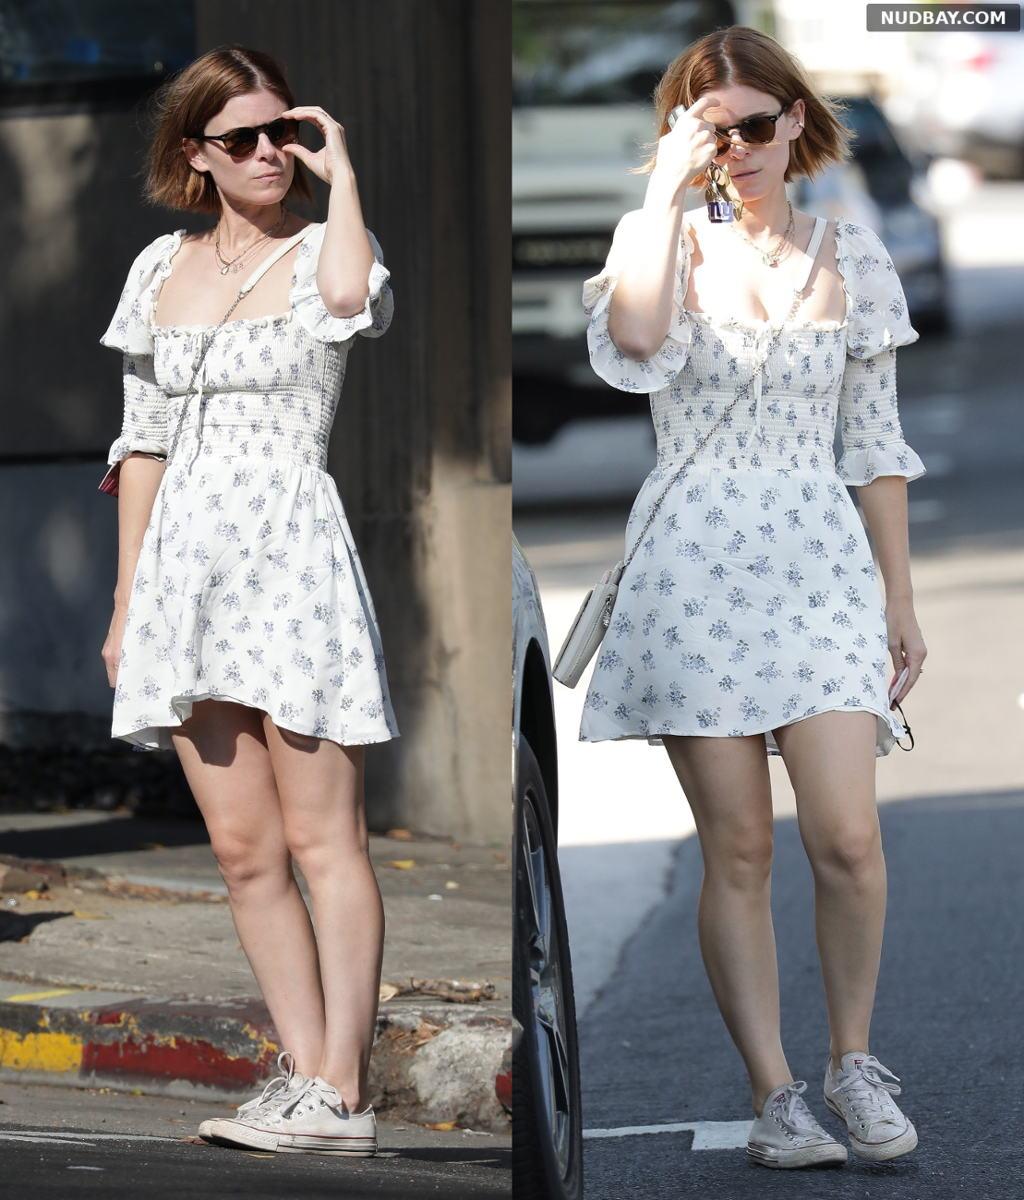 Kate Mara leaves Little Dom's restaurant in Los Feliz Sep 20 2021